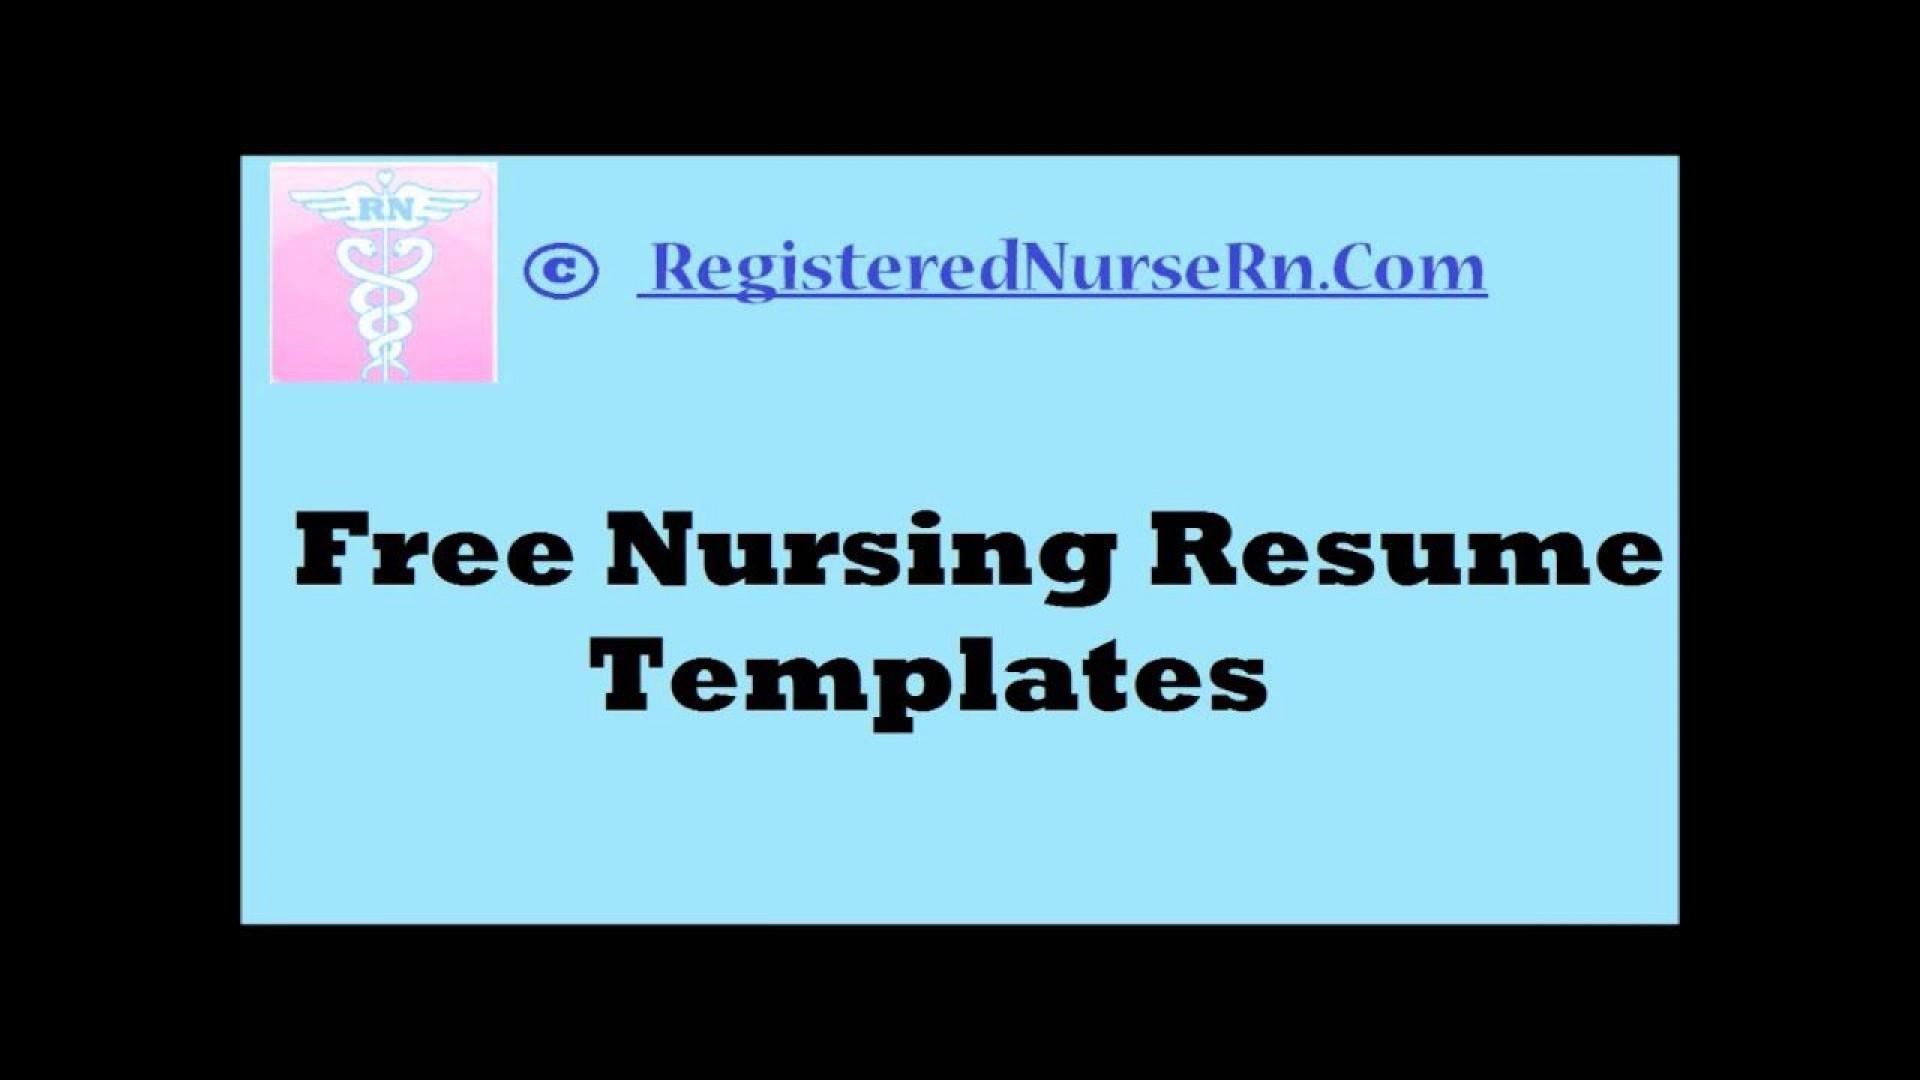 007 Stupendou Nurse Resume Template Word Design  Cv Free Download Rn1920